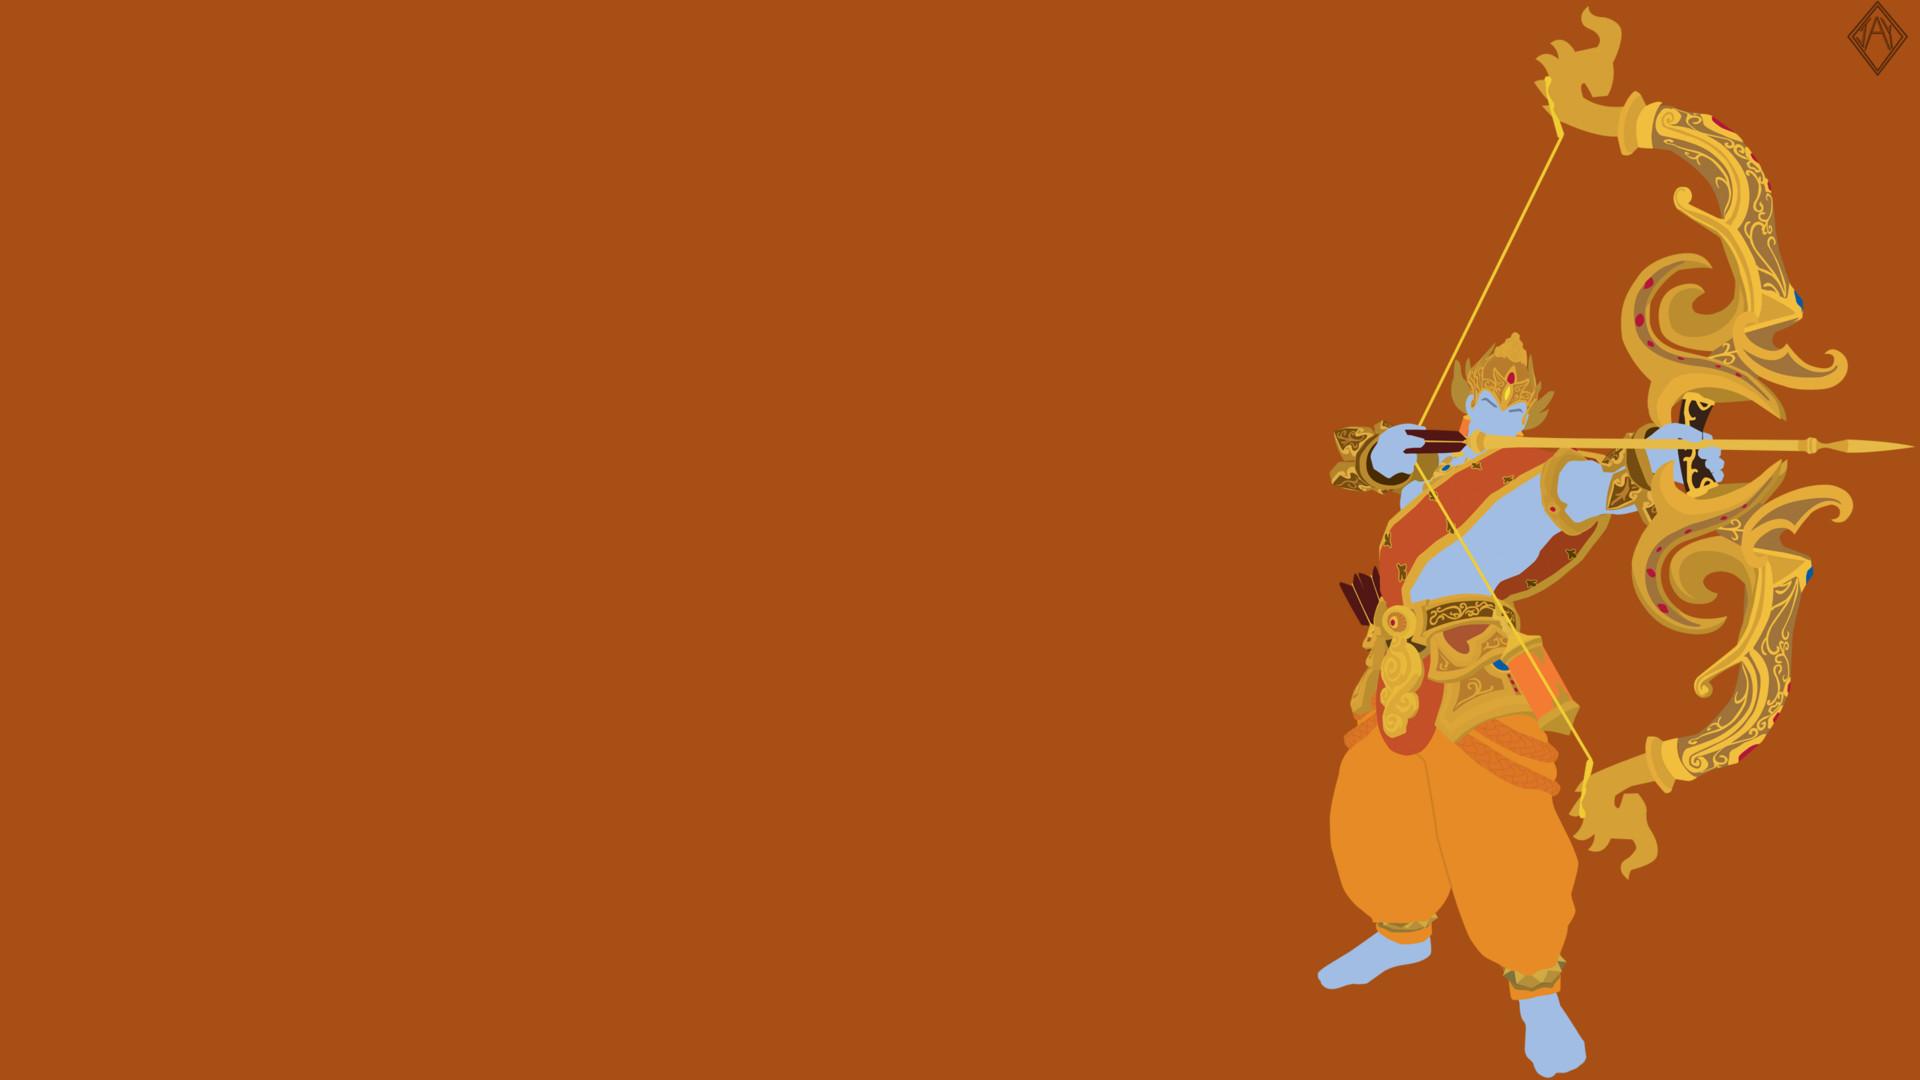 Smite | Rama Minimalist Wallpaper